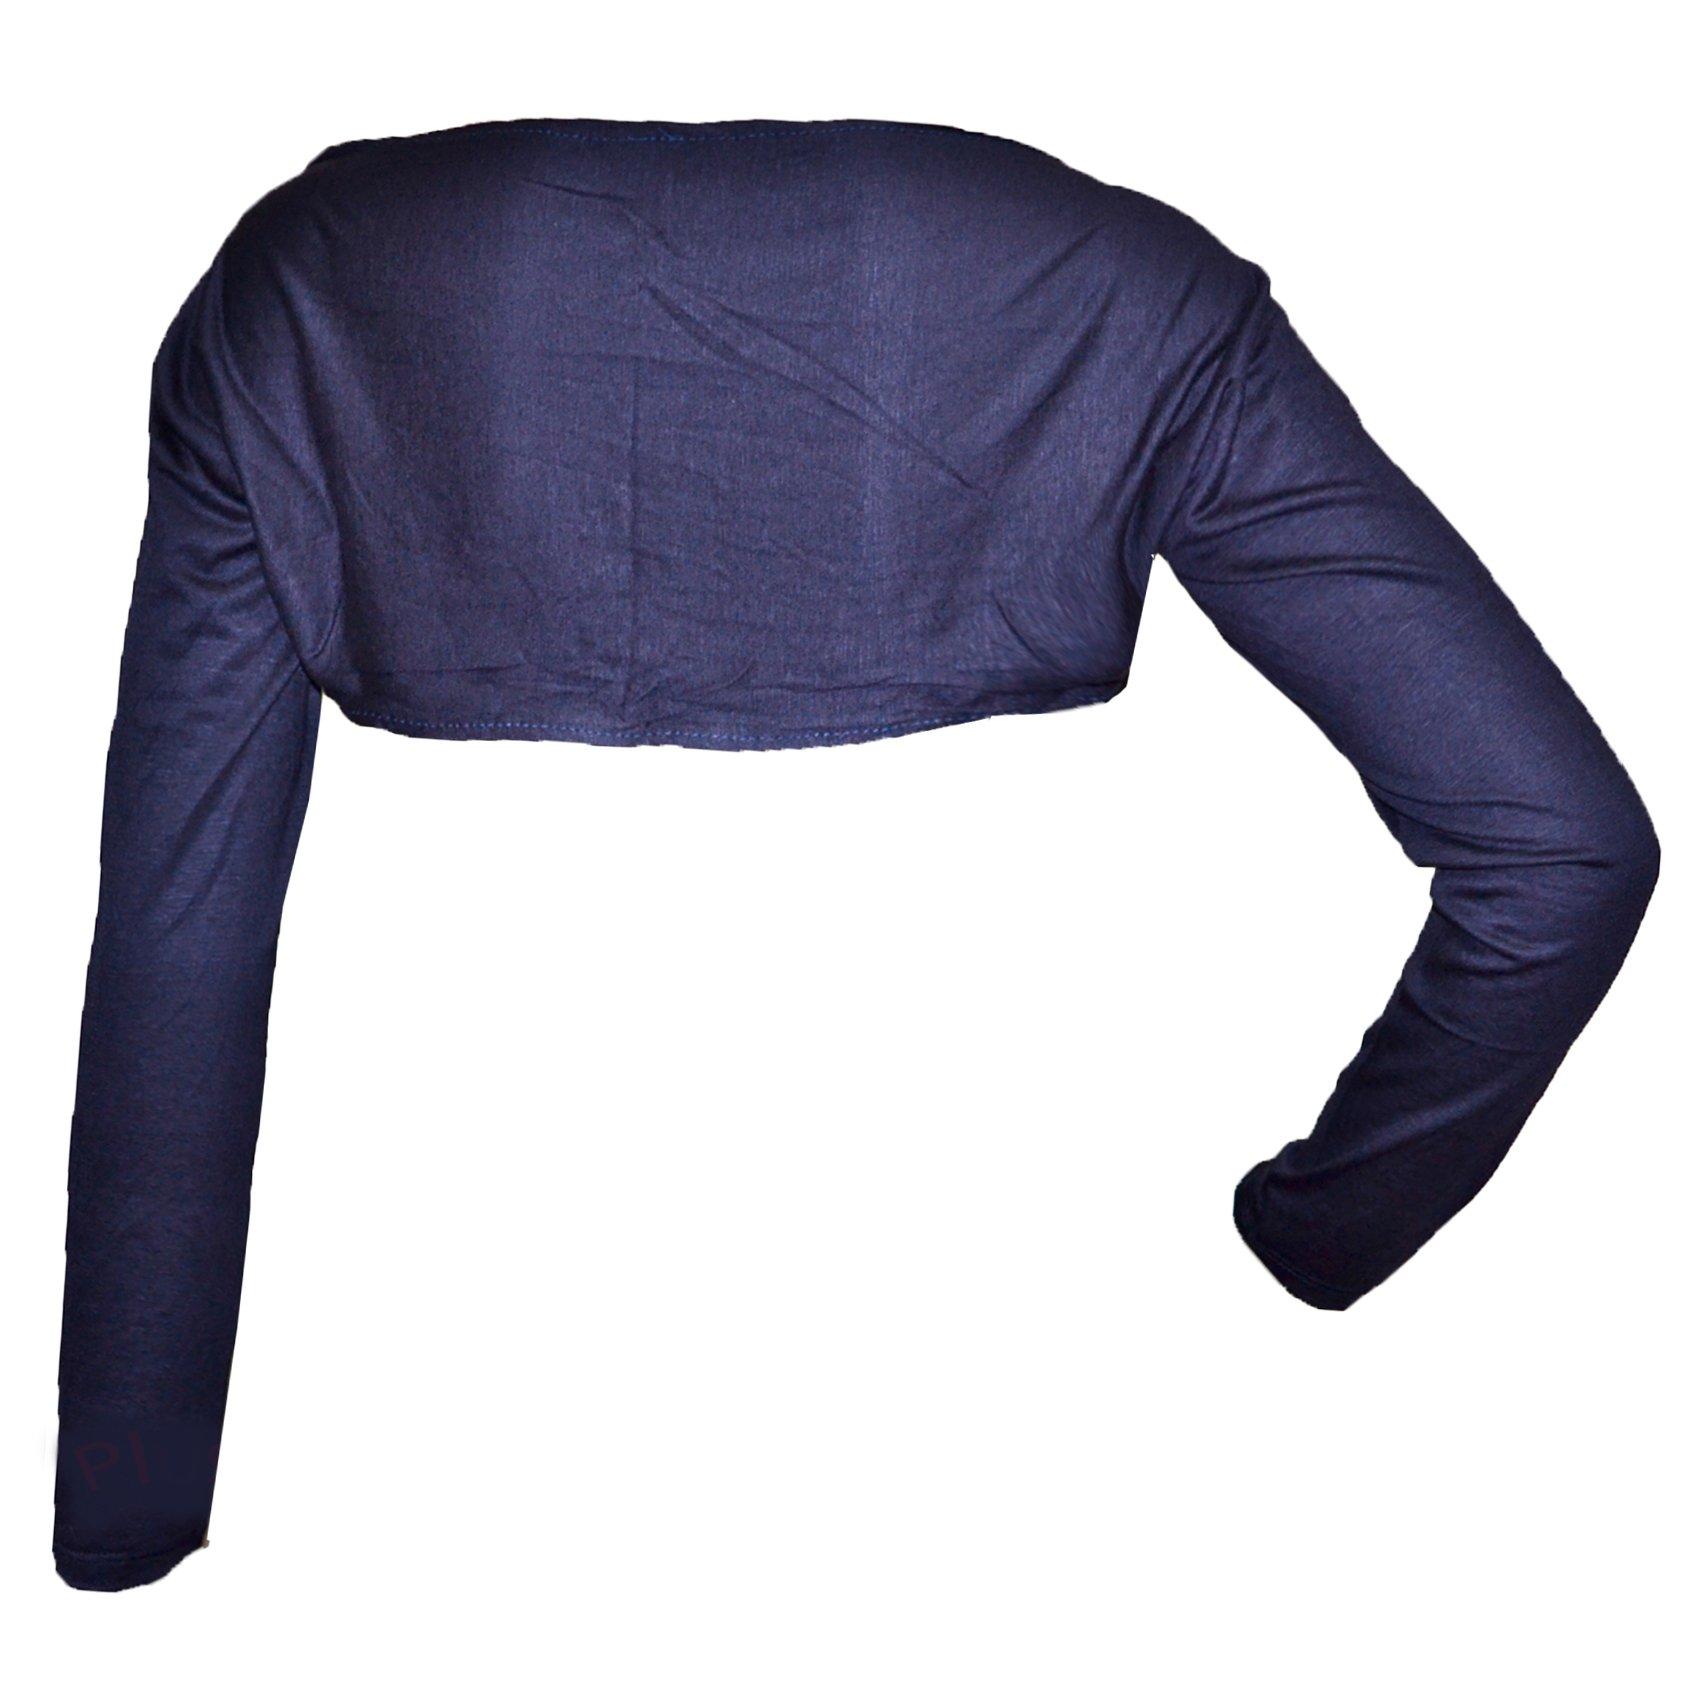 HAYAA Clothing Seamless Shrug Bolero 1-pc Muslim Sleeves Plus Size (Navy)